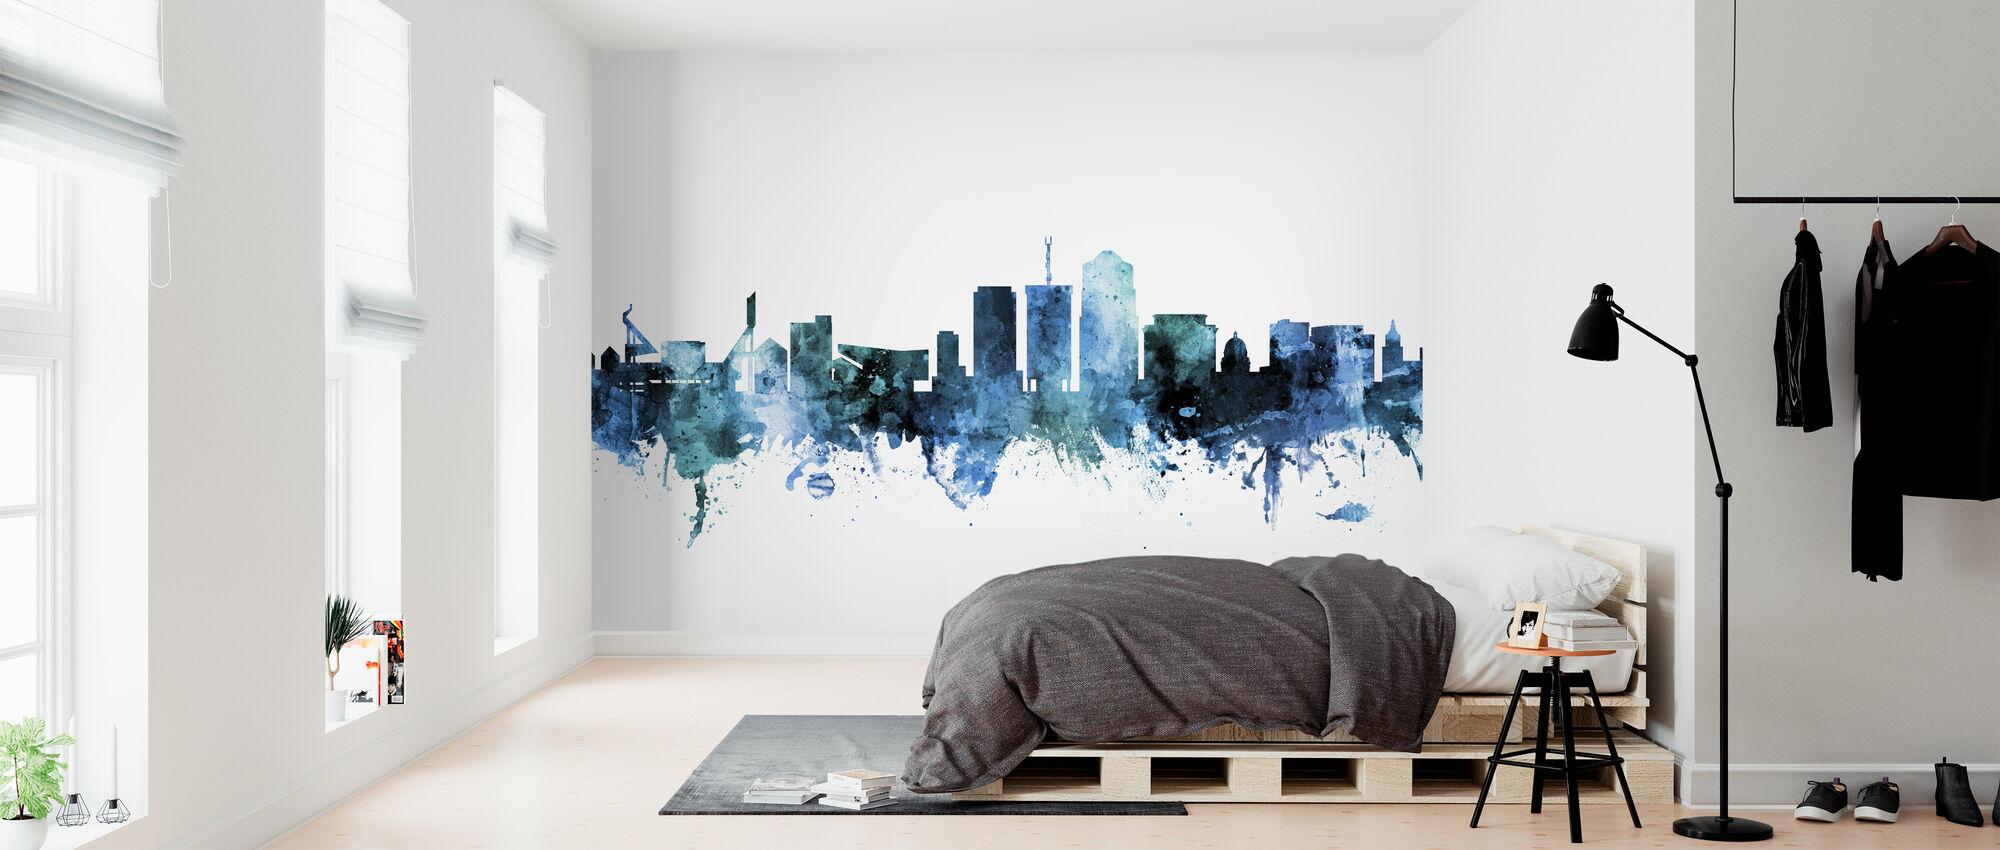 Tucson Arizona Skyline - Wallpaper - Bedroom